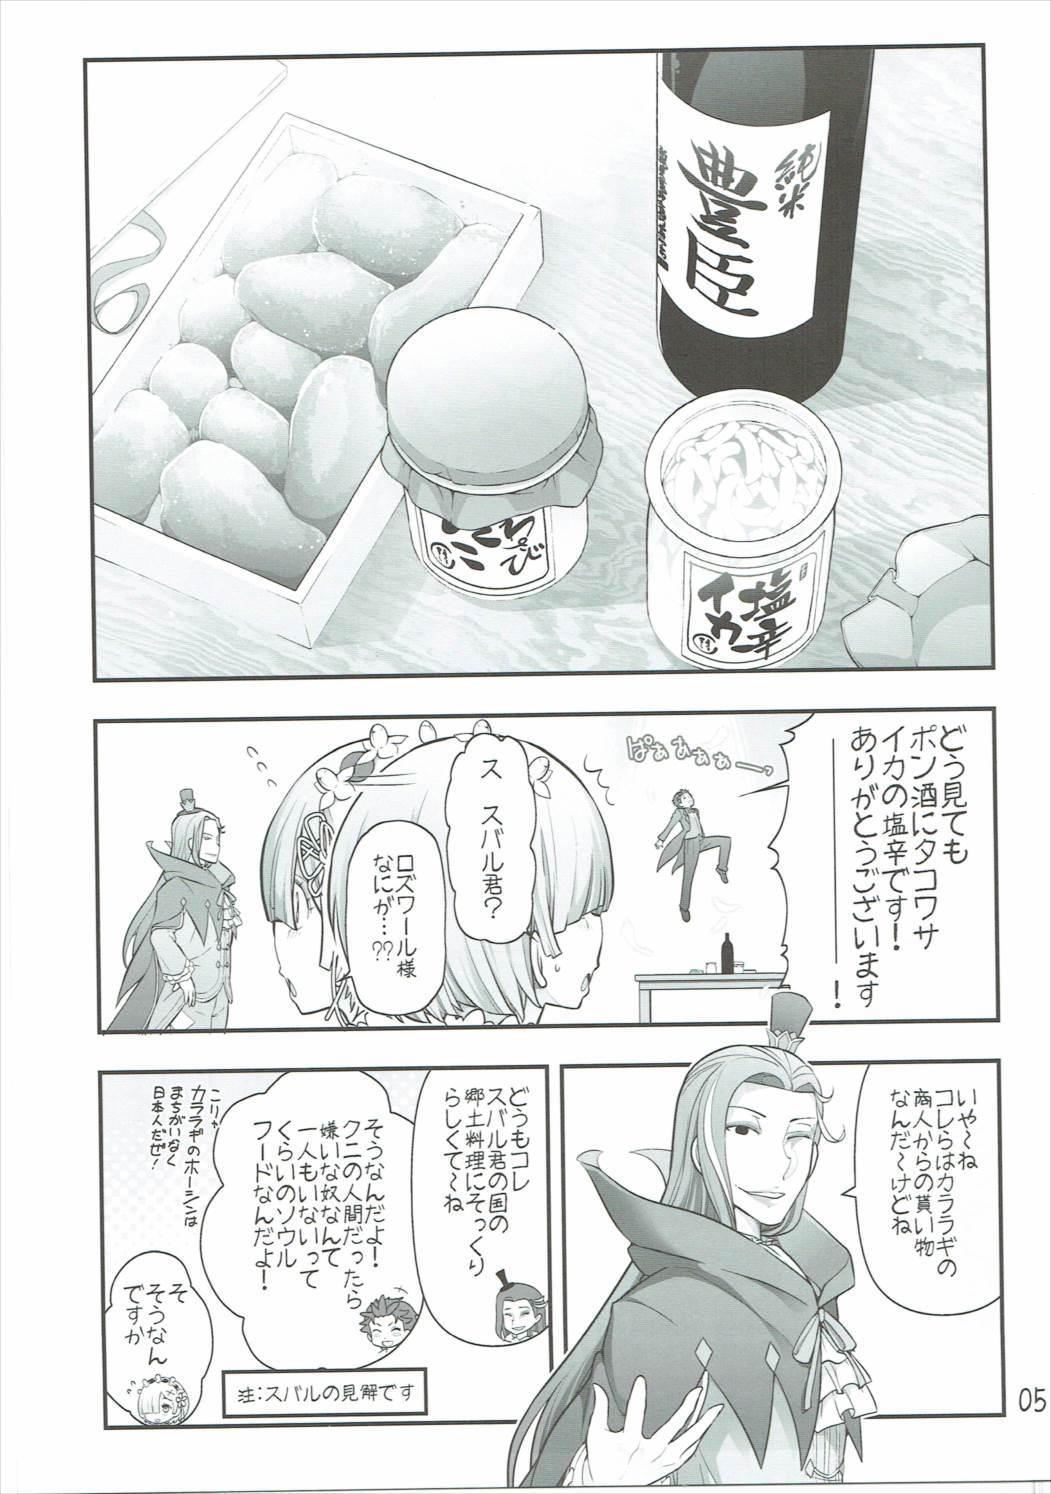 RMH Rem-san maji ecchi 5